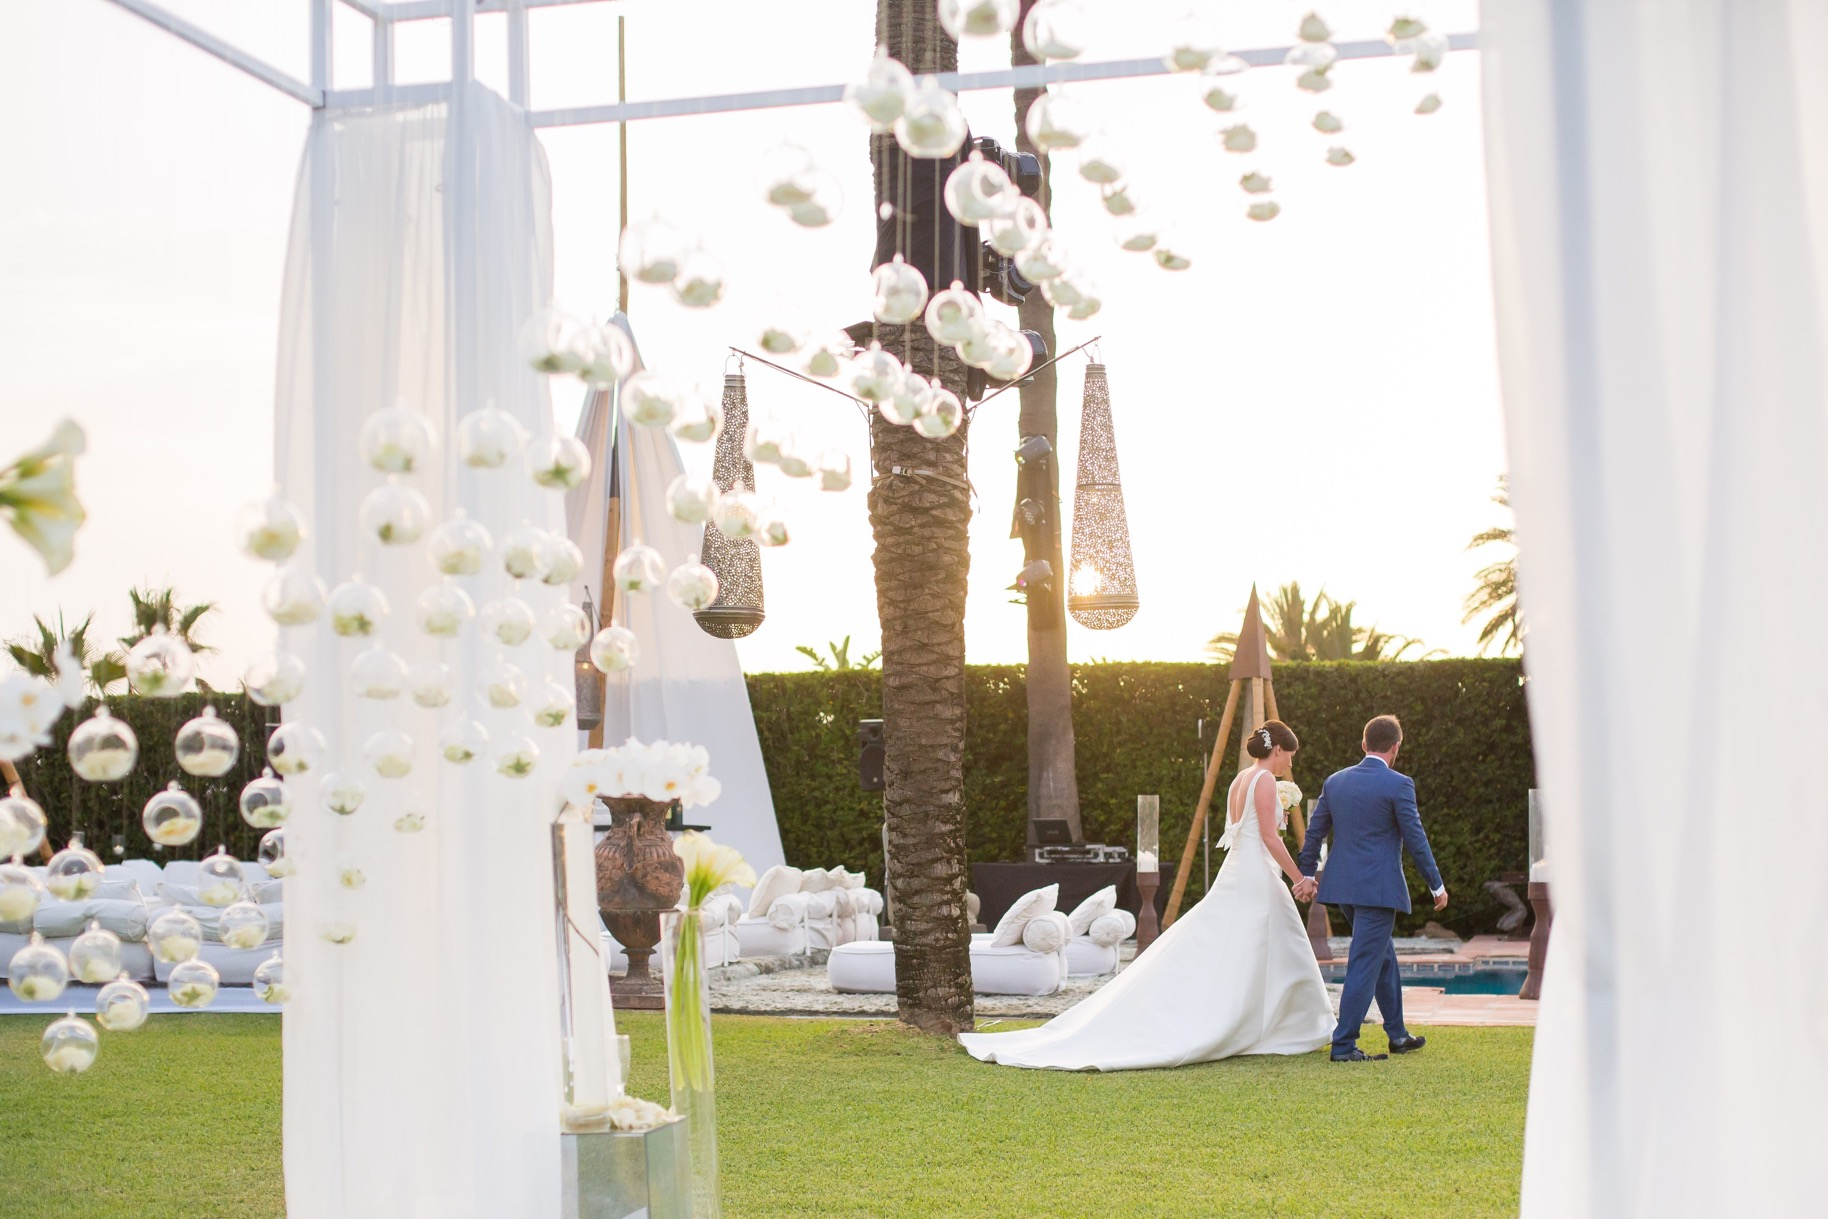 Si-Quiero-Wedding-Planner-By-Sira-Antequera-Bodas-Málaga-Marbella-Miami-01